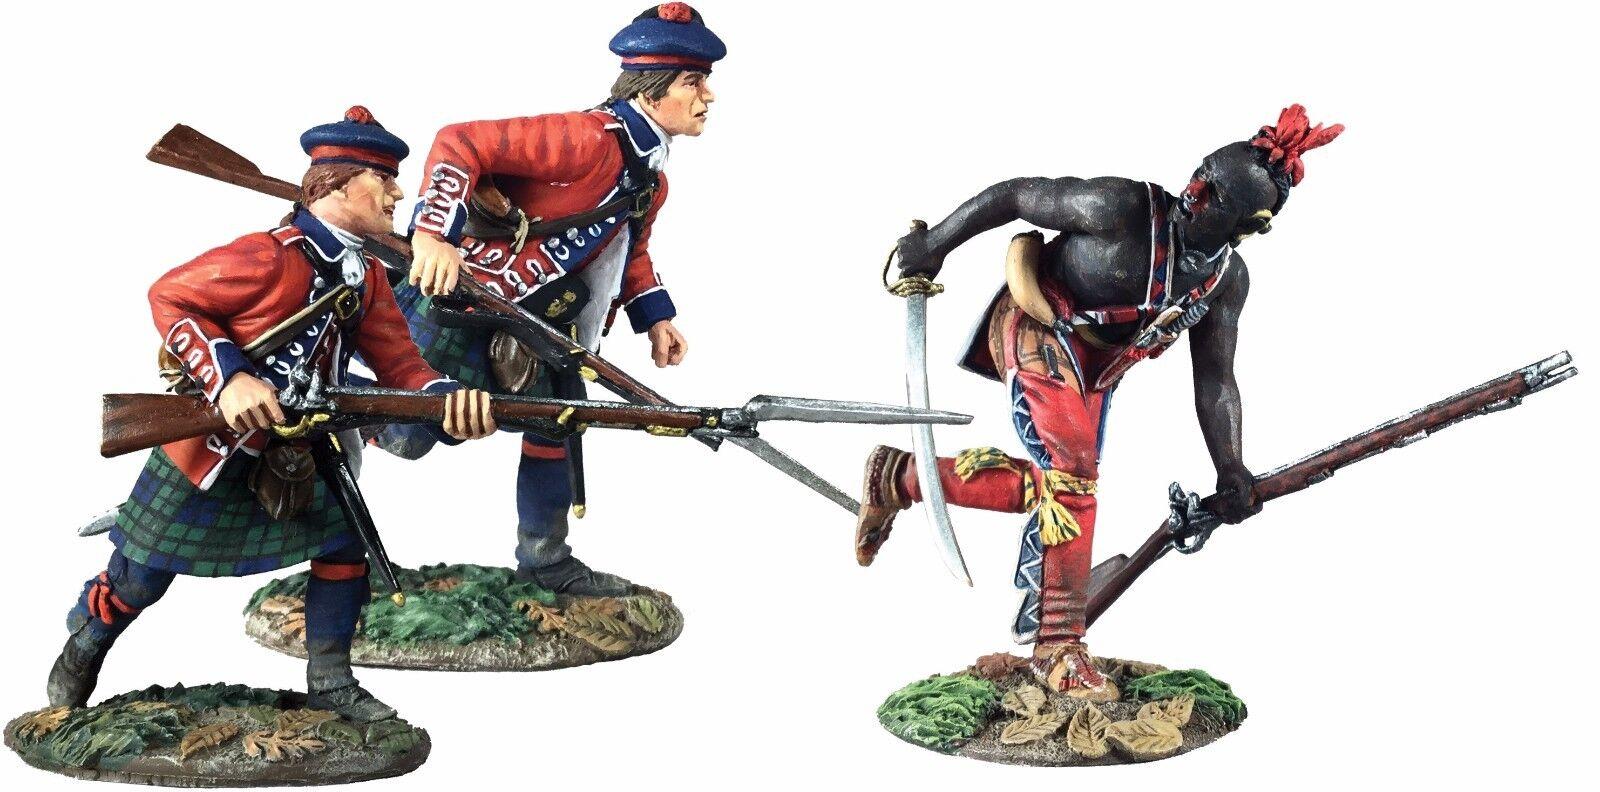 W Britain 16039 Art of War, Battle of Bushy Run No.1 - 3 Pc Set/Limited Edition